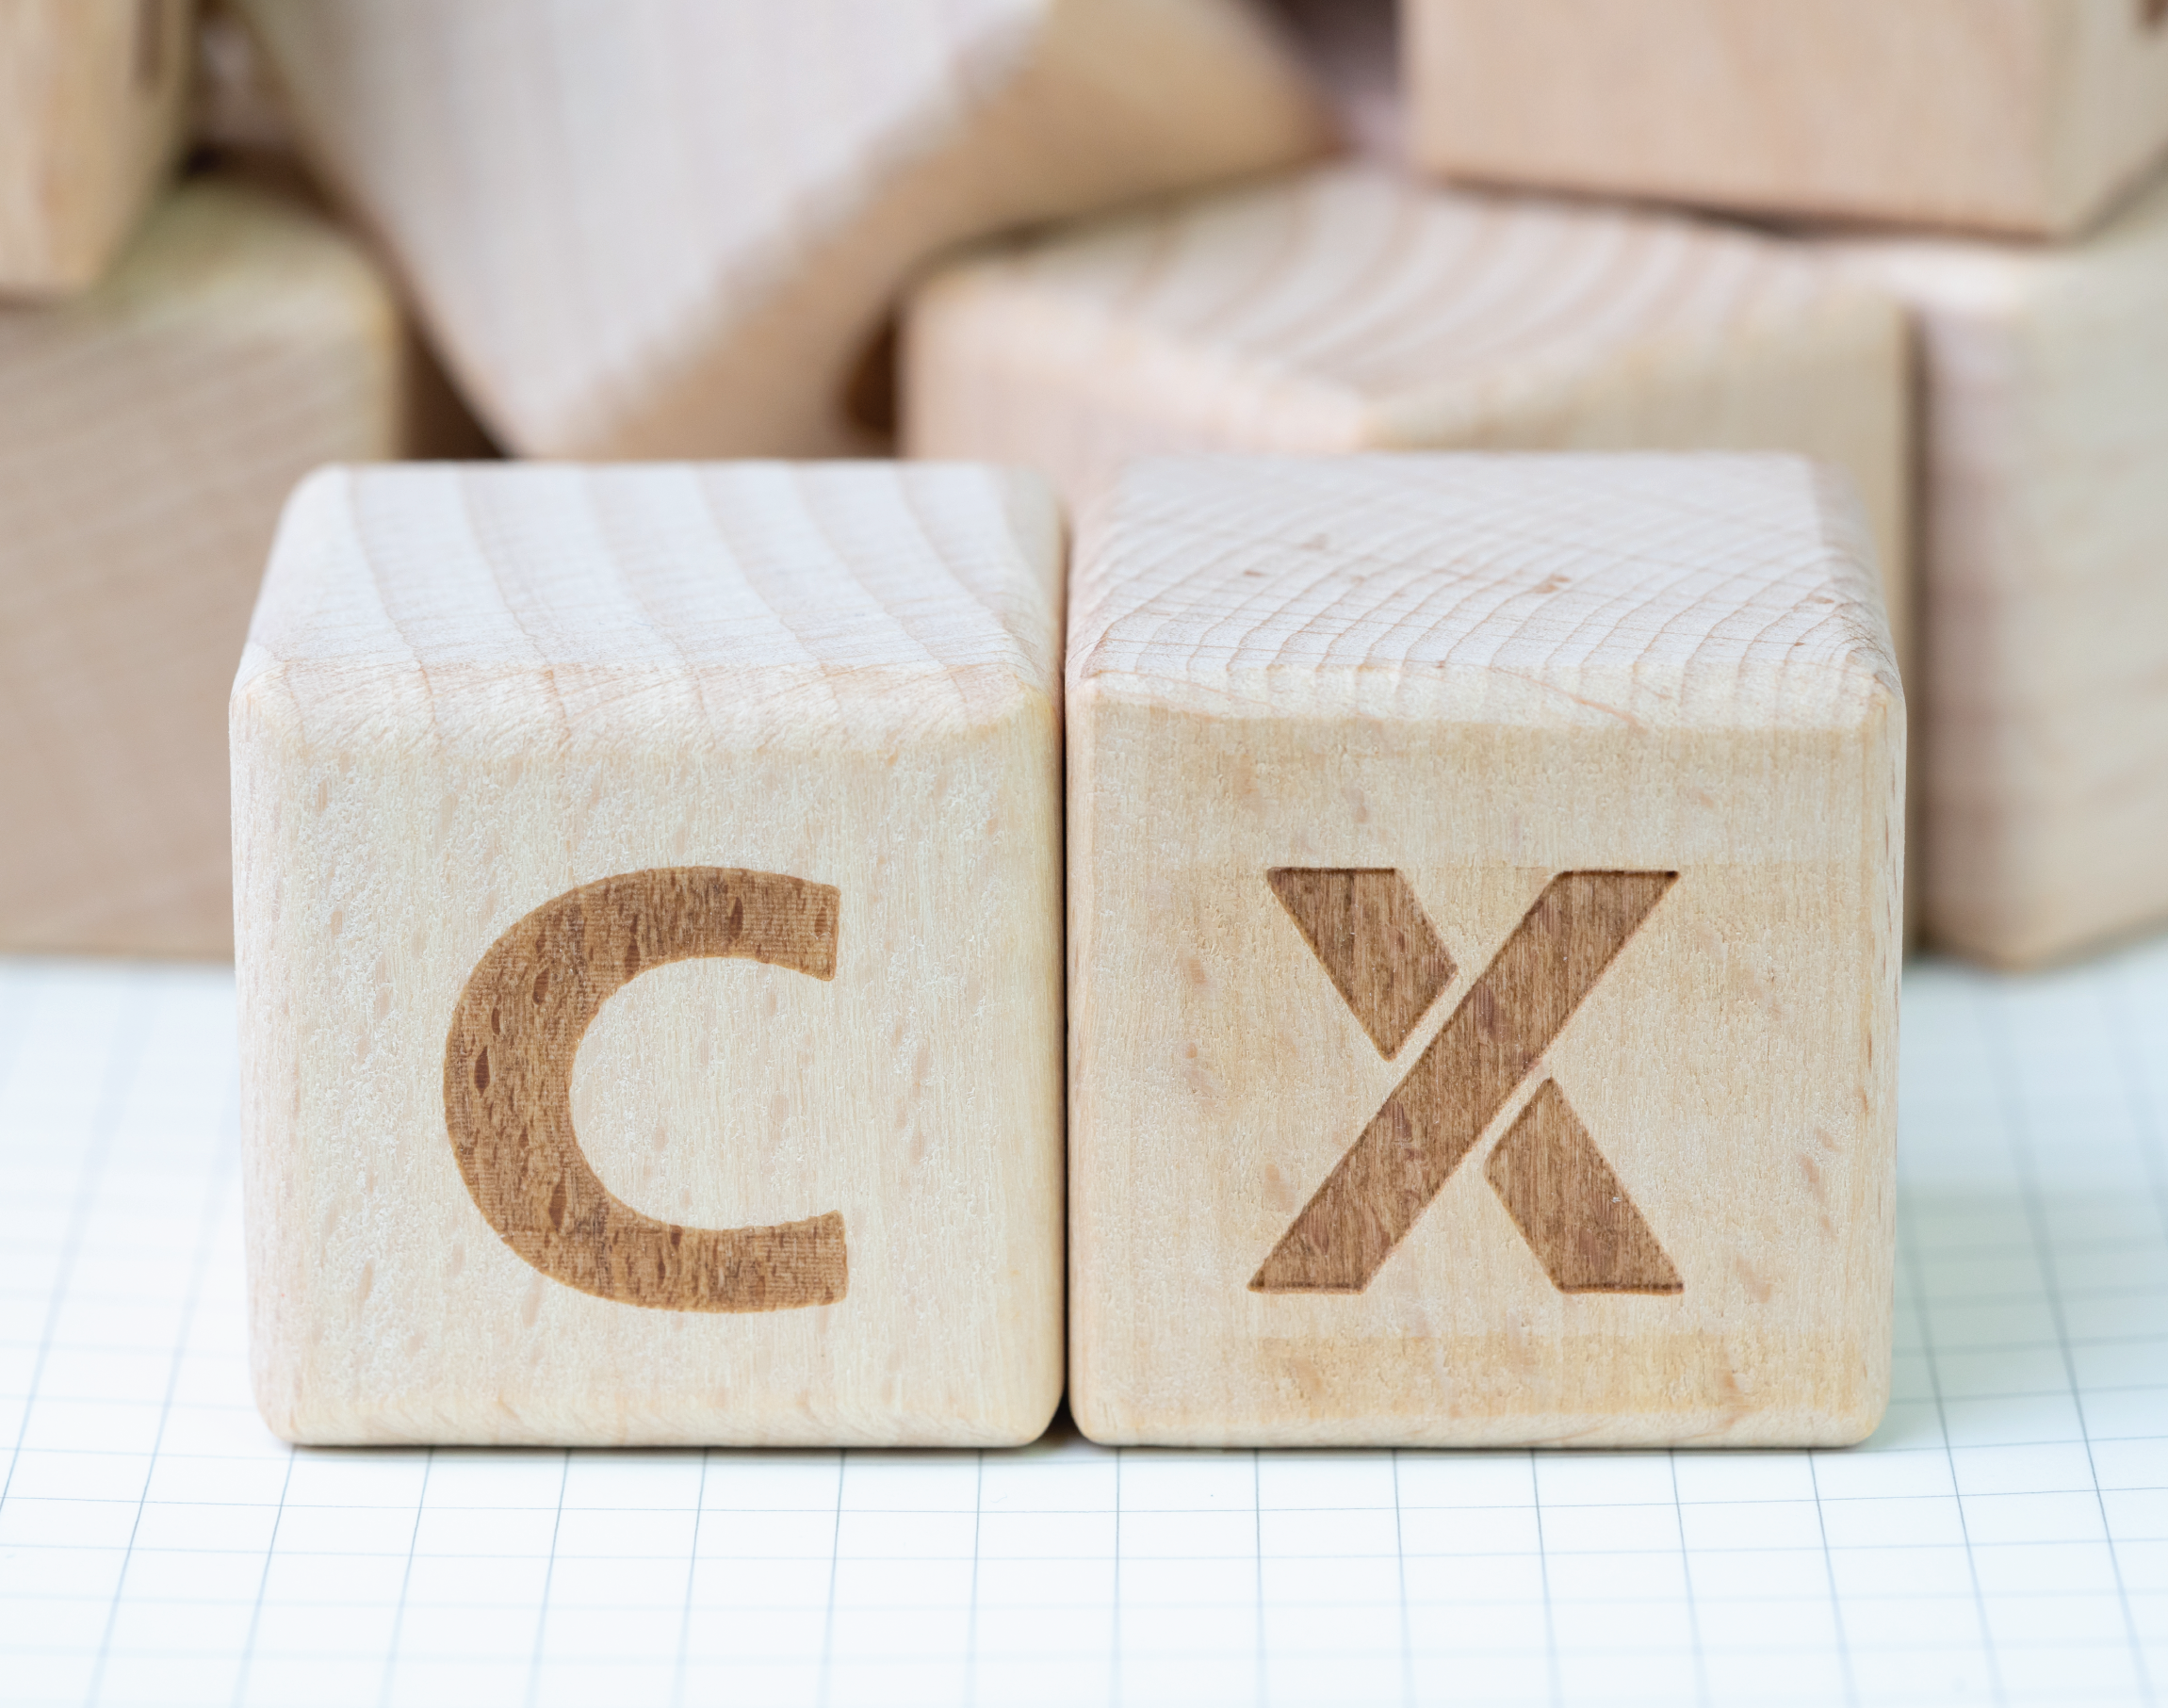 IQBusinesss CX Trends 542x425-01